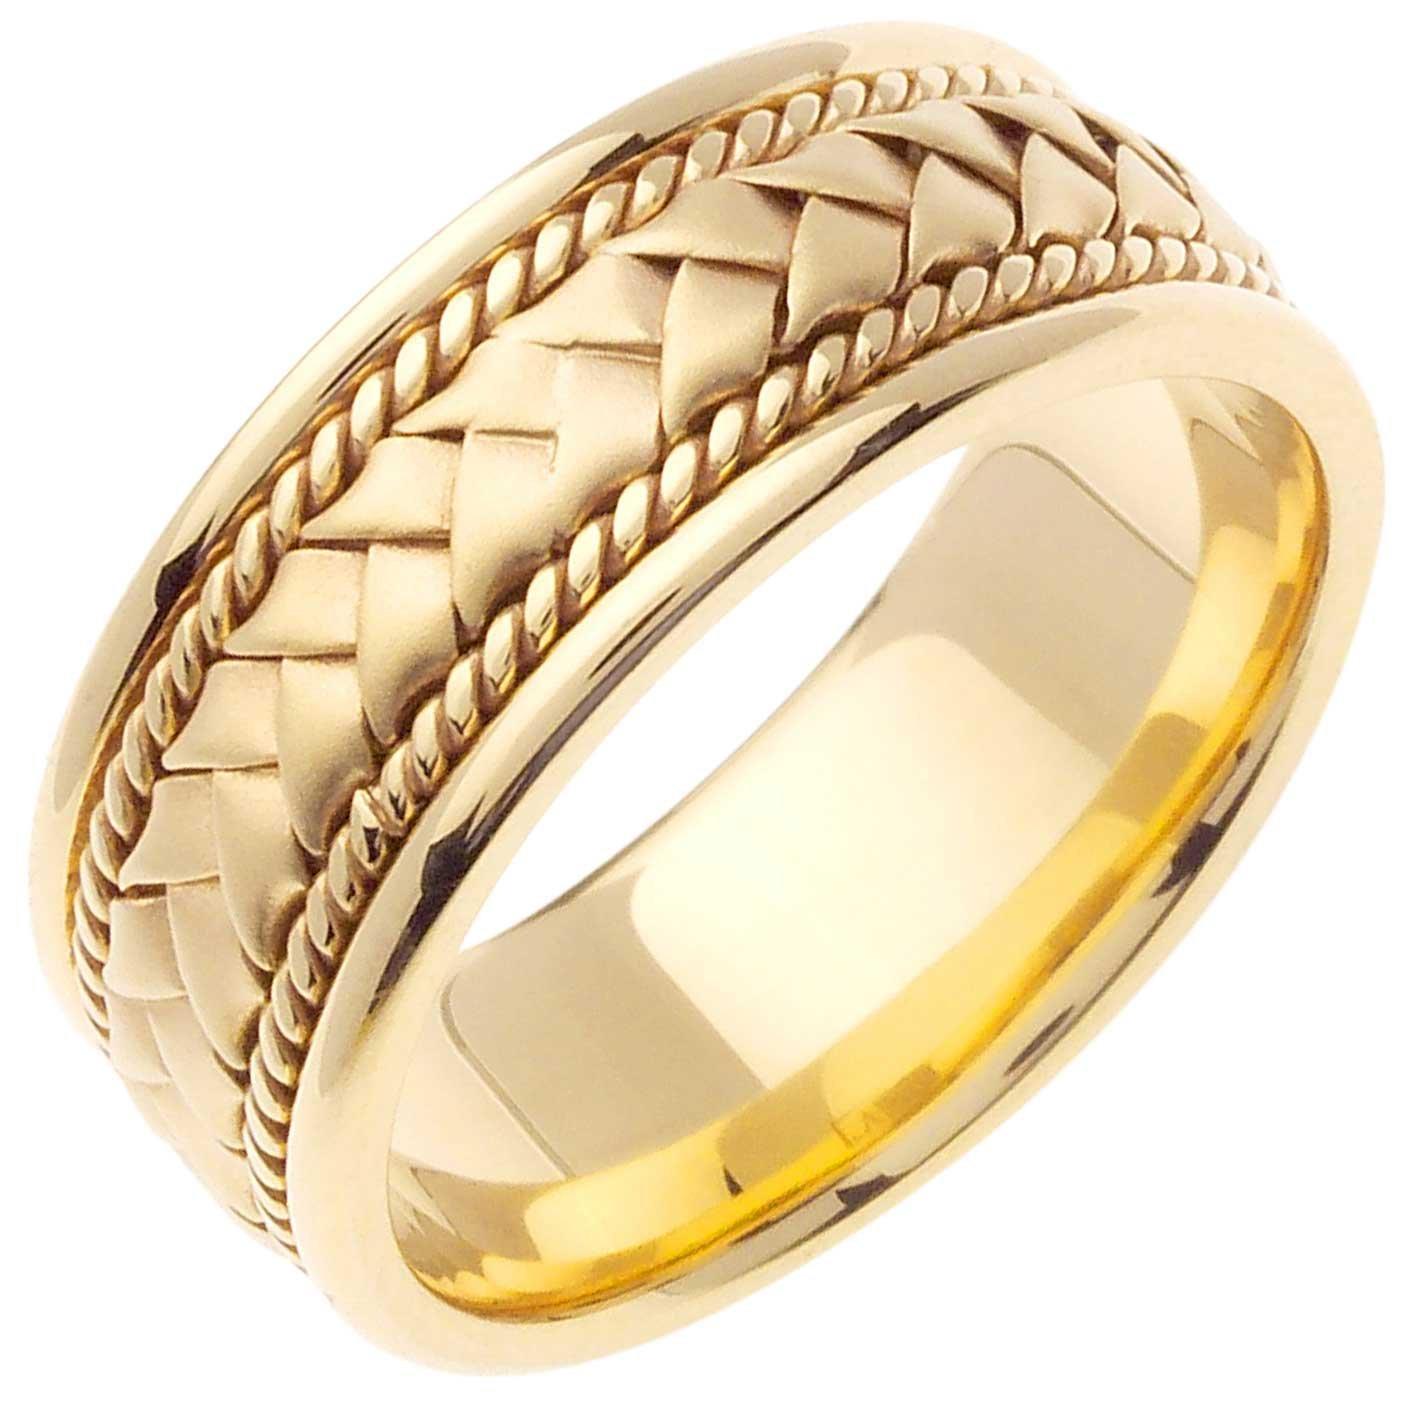 14K Gold Braided Basket Weave Men's Comfort Fit Wedding Band (8.5mm) Size-13c1